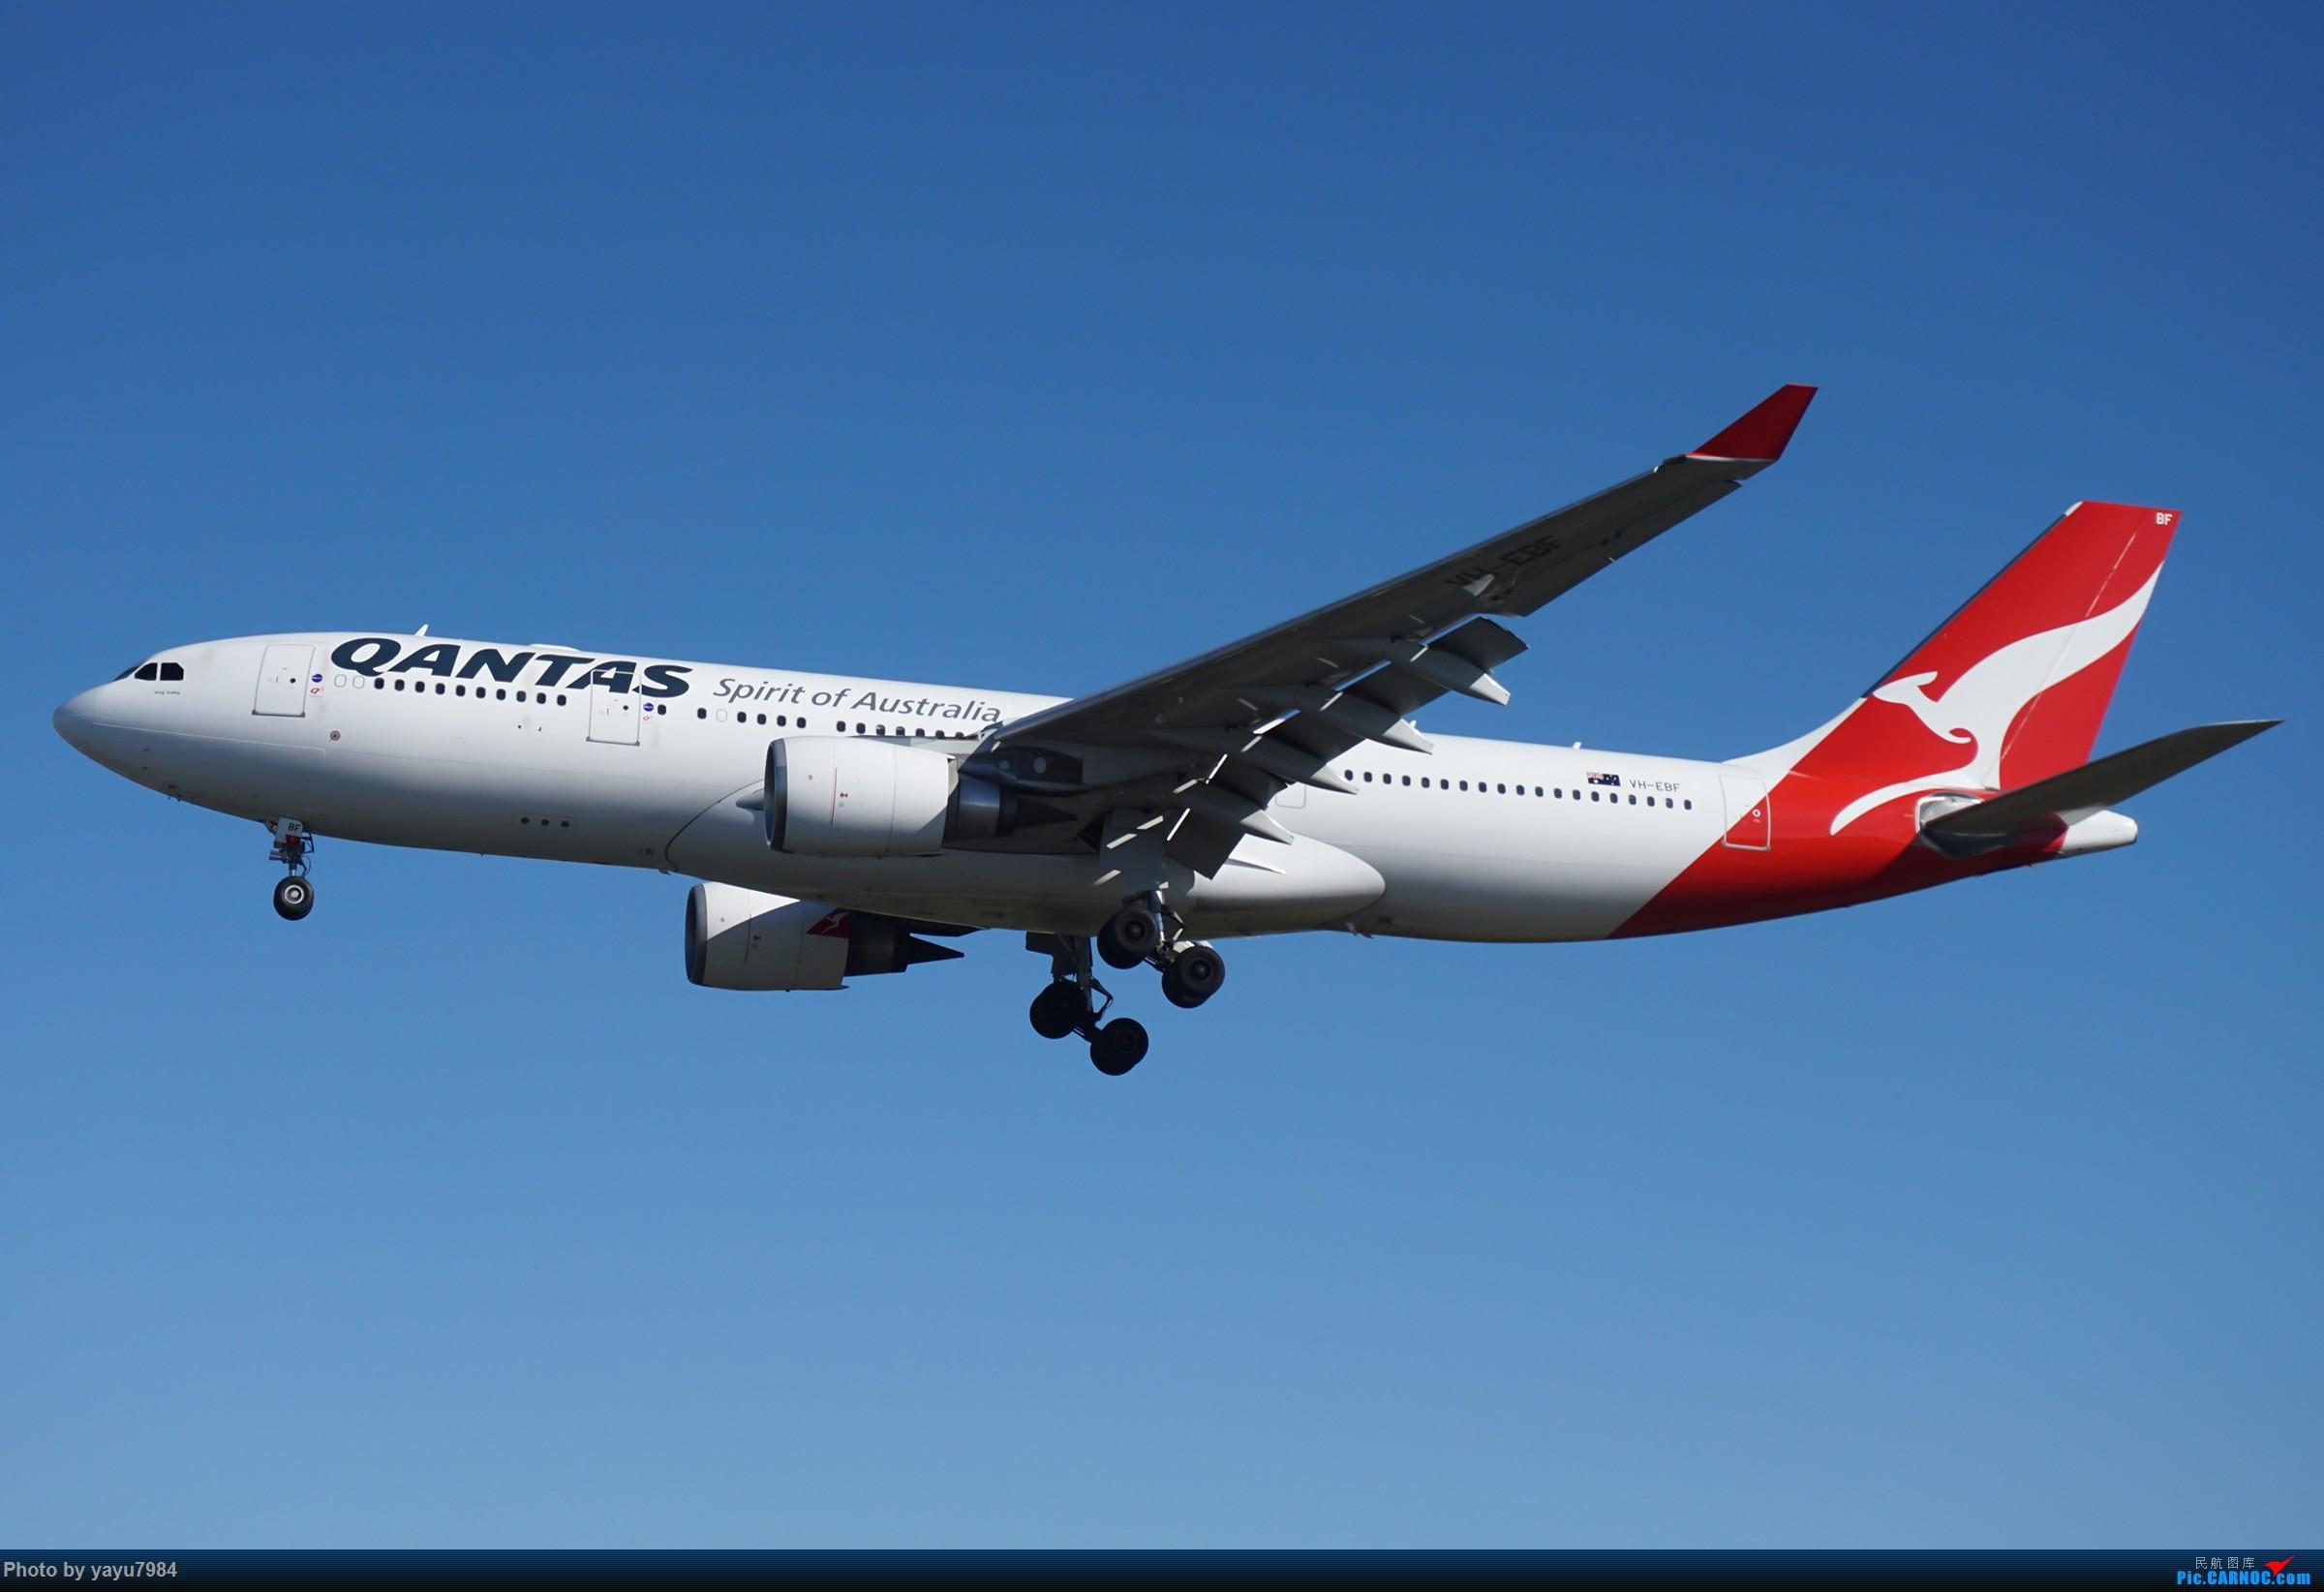 Re:[原创][SYD] 晨悉尼,16R扎堆到达 AIRBUS A330-200 VH-EBF 澳大利亚悉尼金斯福德·史密斯机场